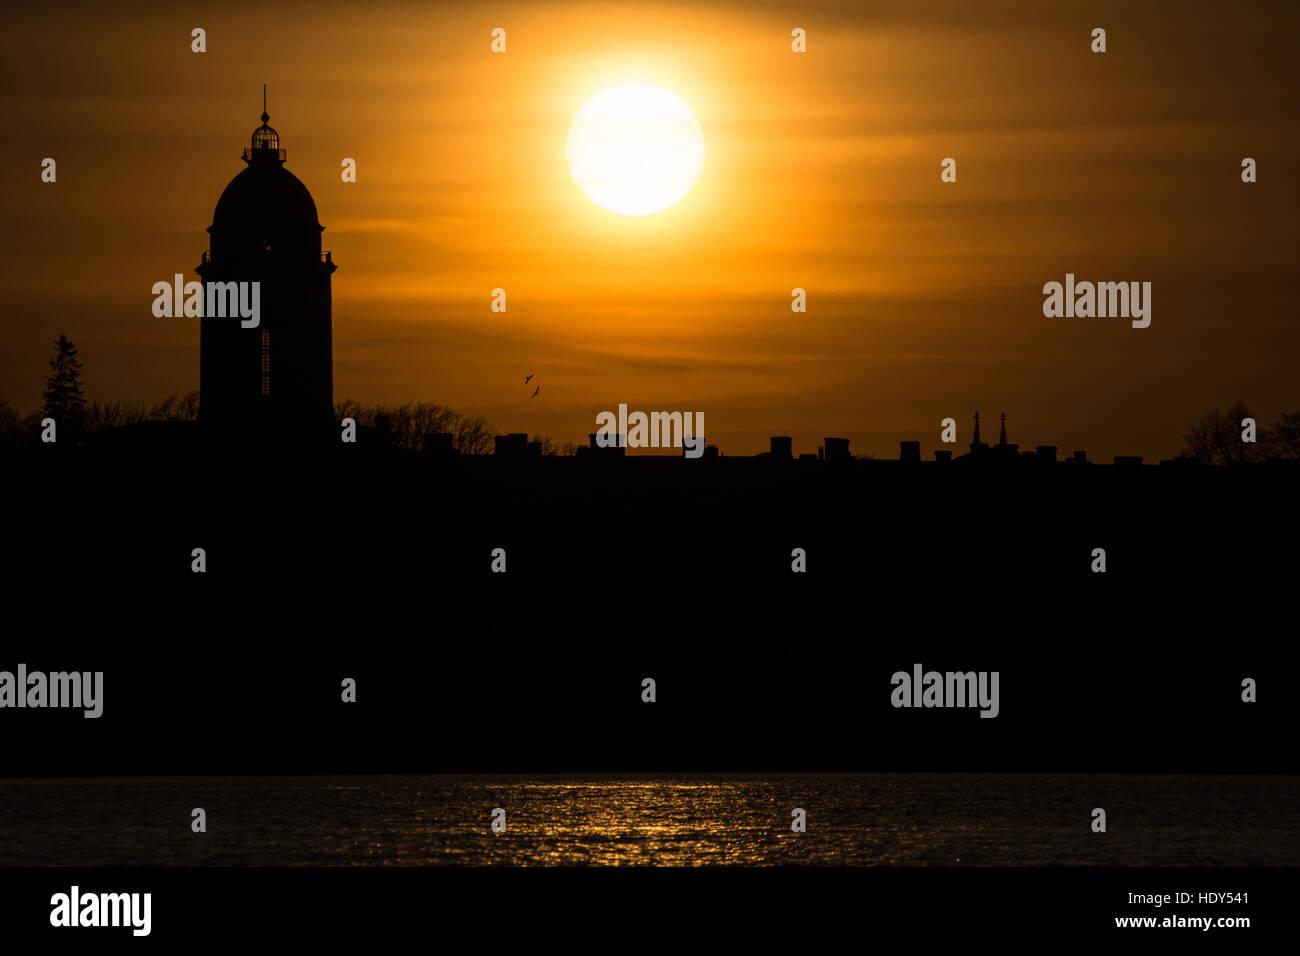 WORLD HERITAGE SITE SUOMENLINNA - Stock Image